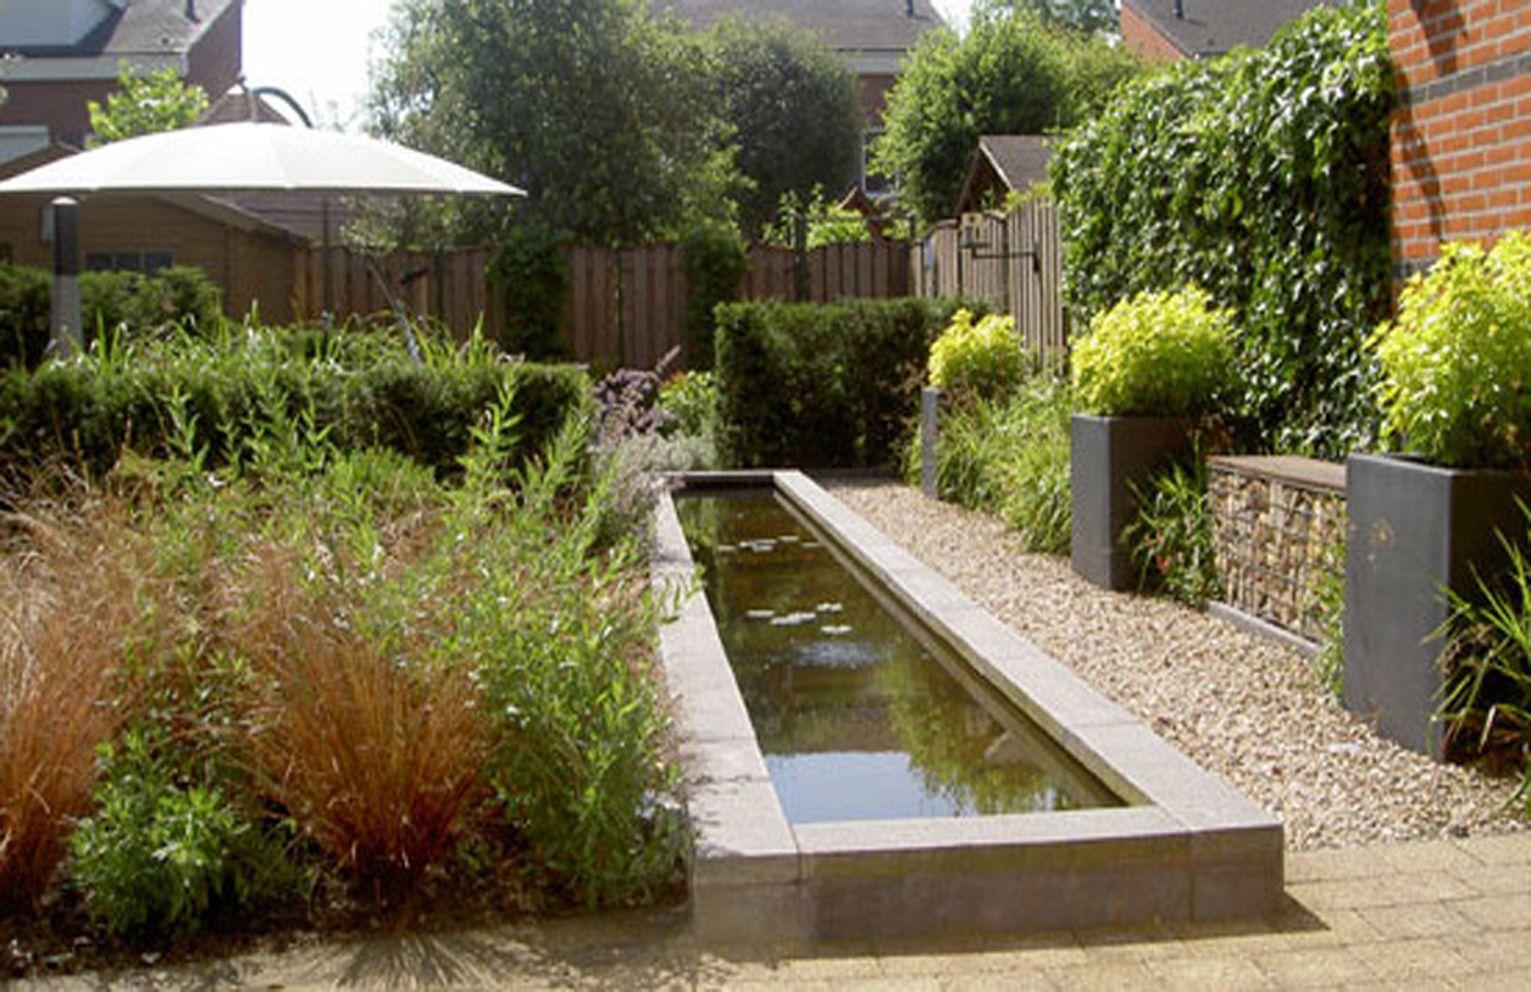 Water Feature Needed. Vegetable Garden Designs And Ideas Garden Fence Ideas  Design Small Japanese Garden Design Ideas